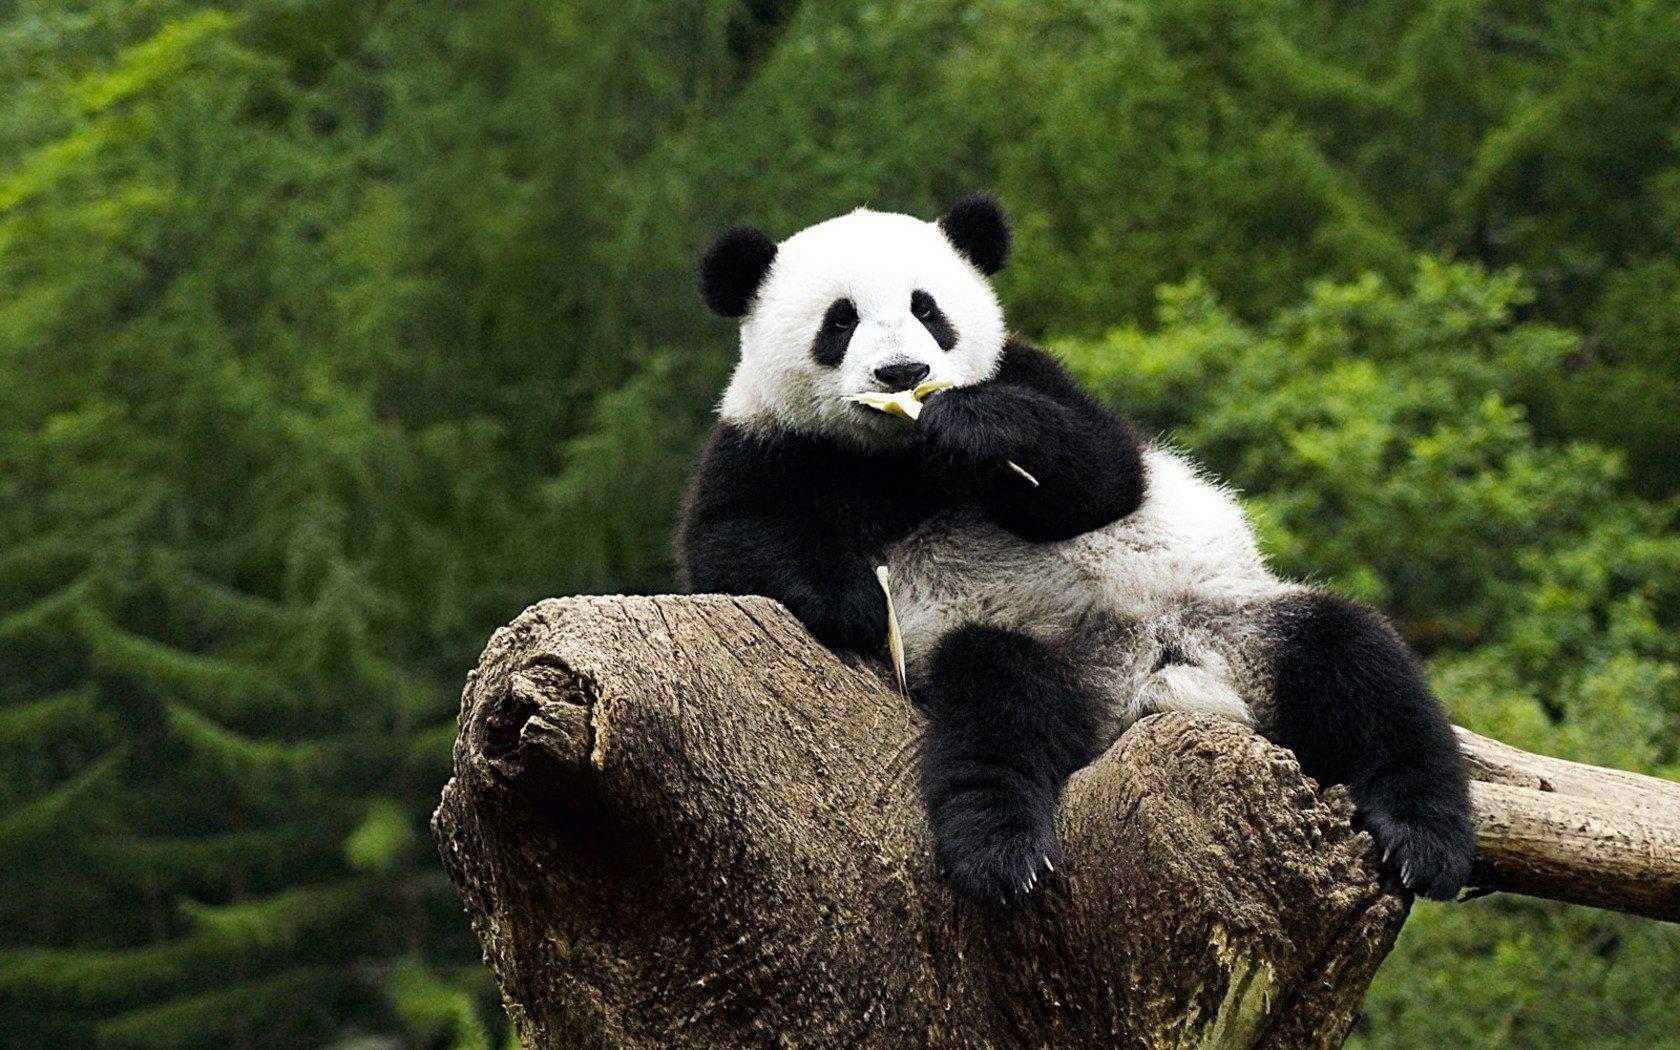 Panda Fond d'écran and Arrière-Plan | 1680x1050 | ID:234237 - Wallpaper Abyss